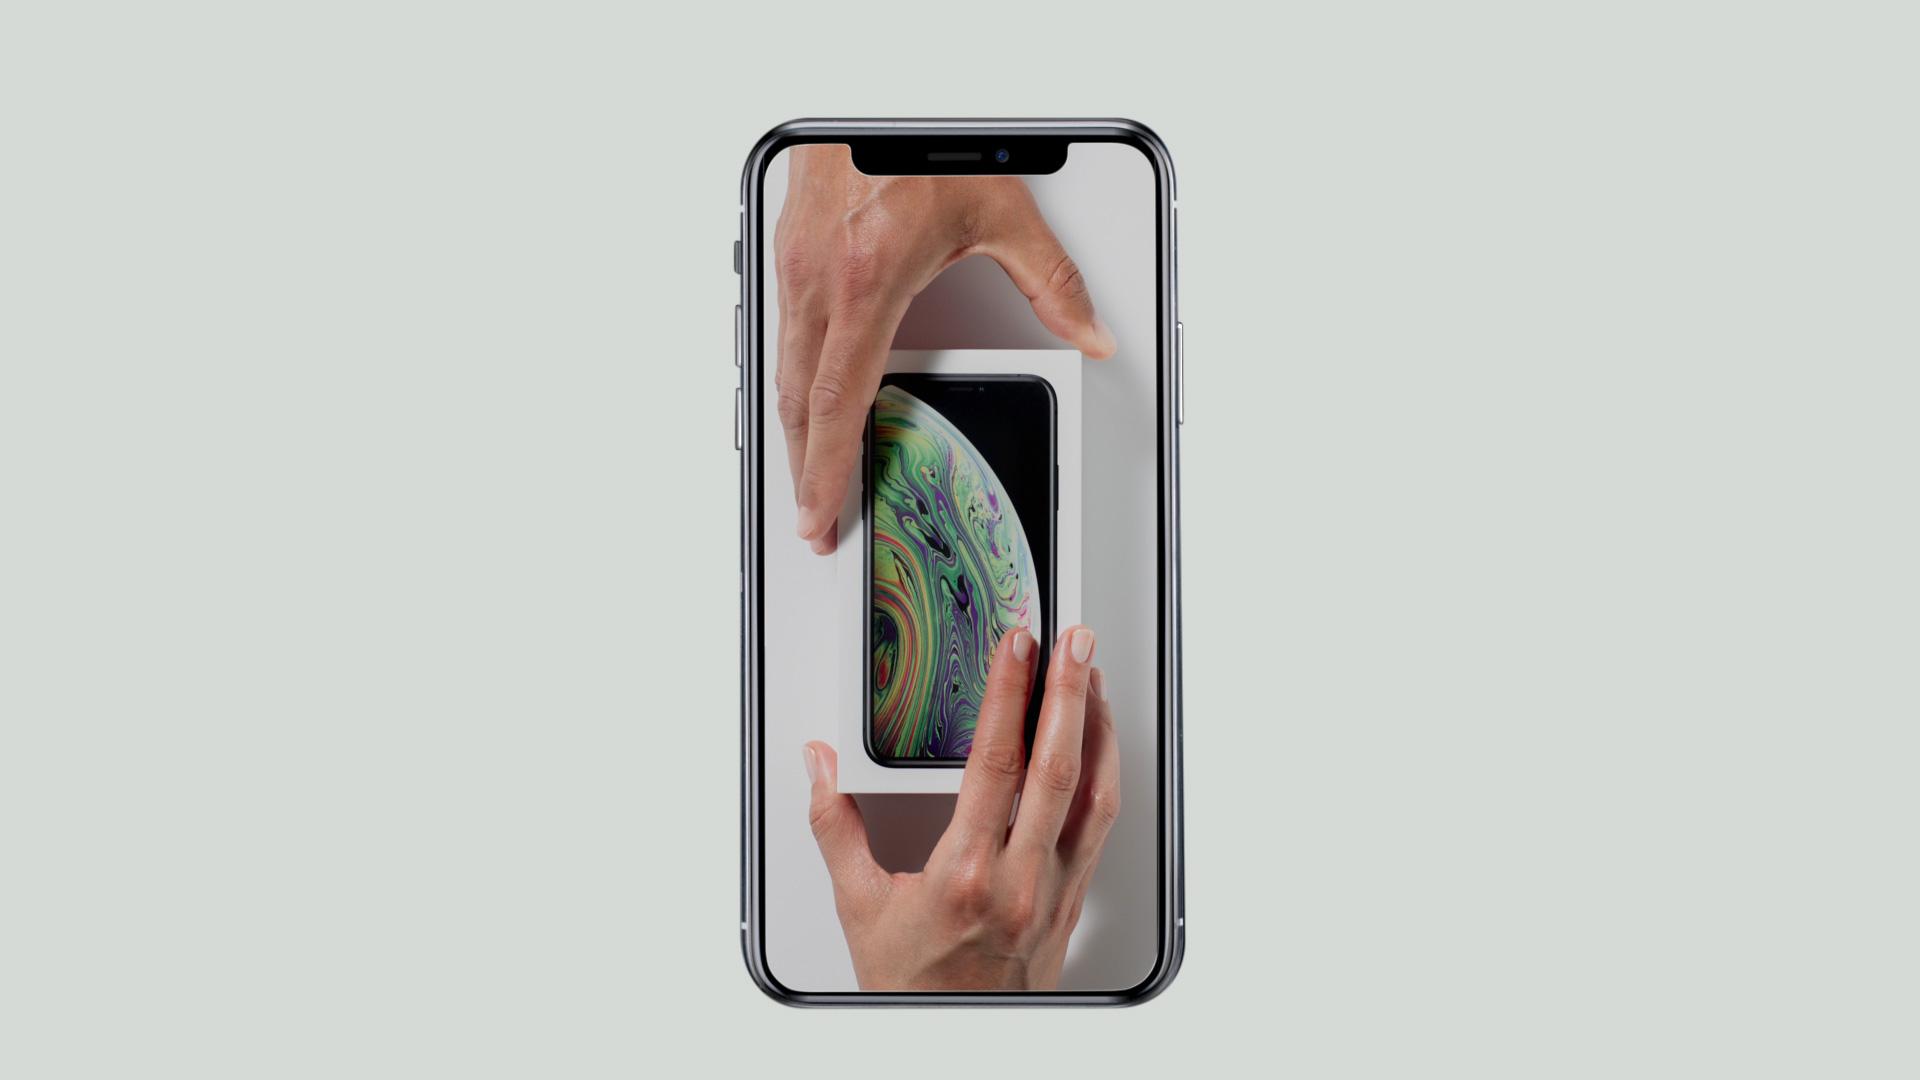 iphone_x_portrait_device_overlay_00351.jpg